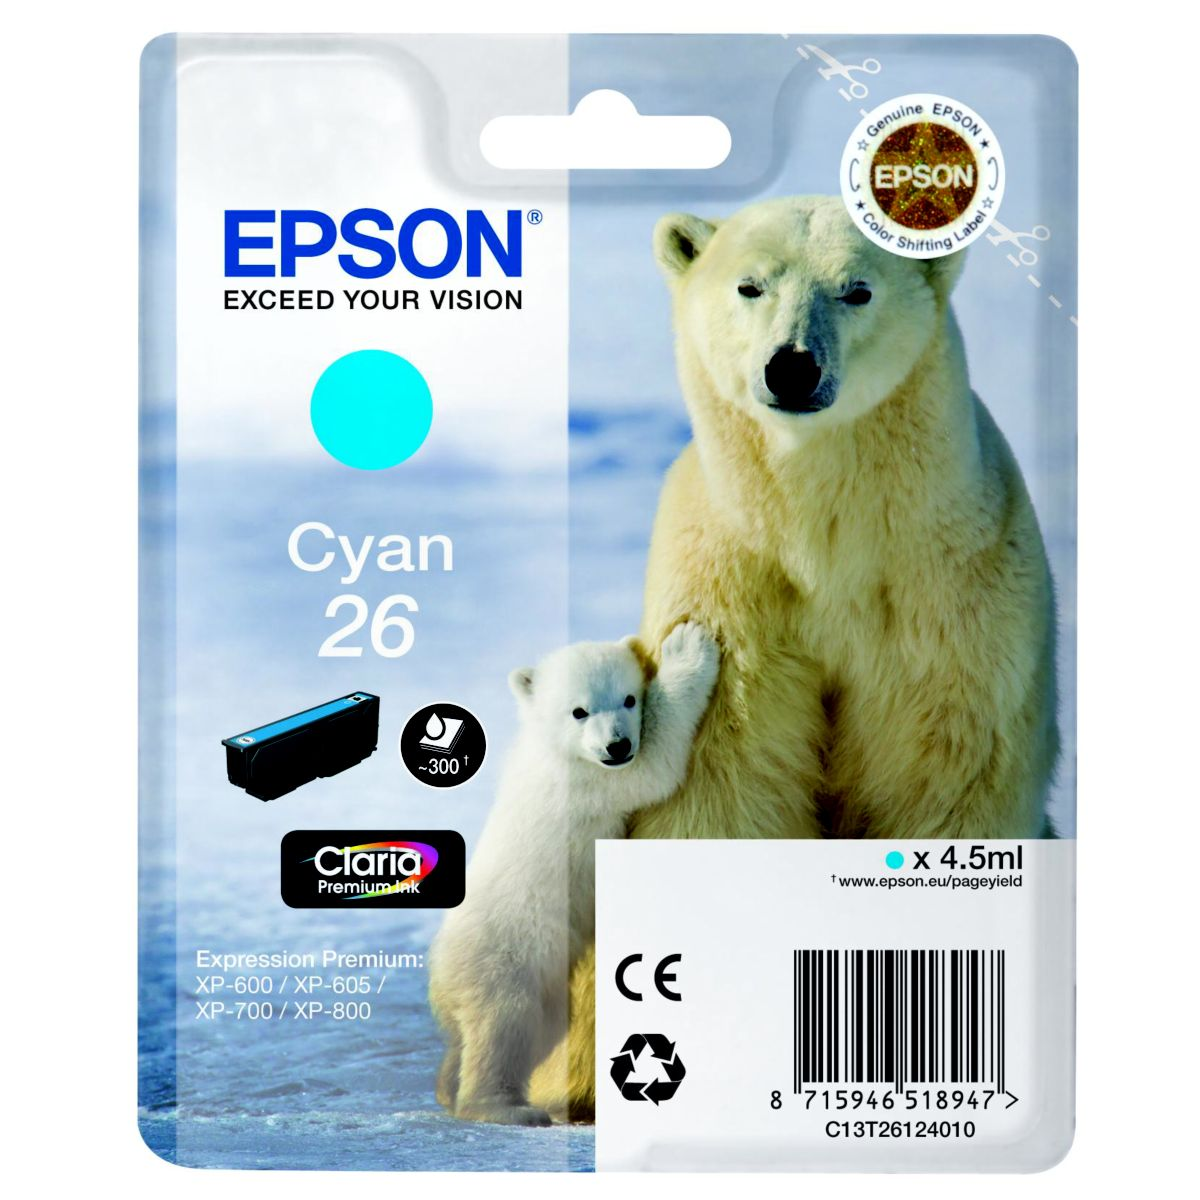 Cartouche d'encre epson t2612 cyan s�rie ours polaire